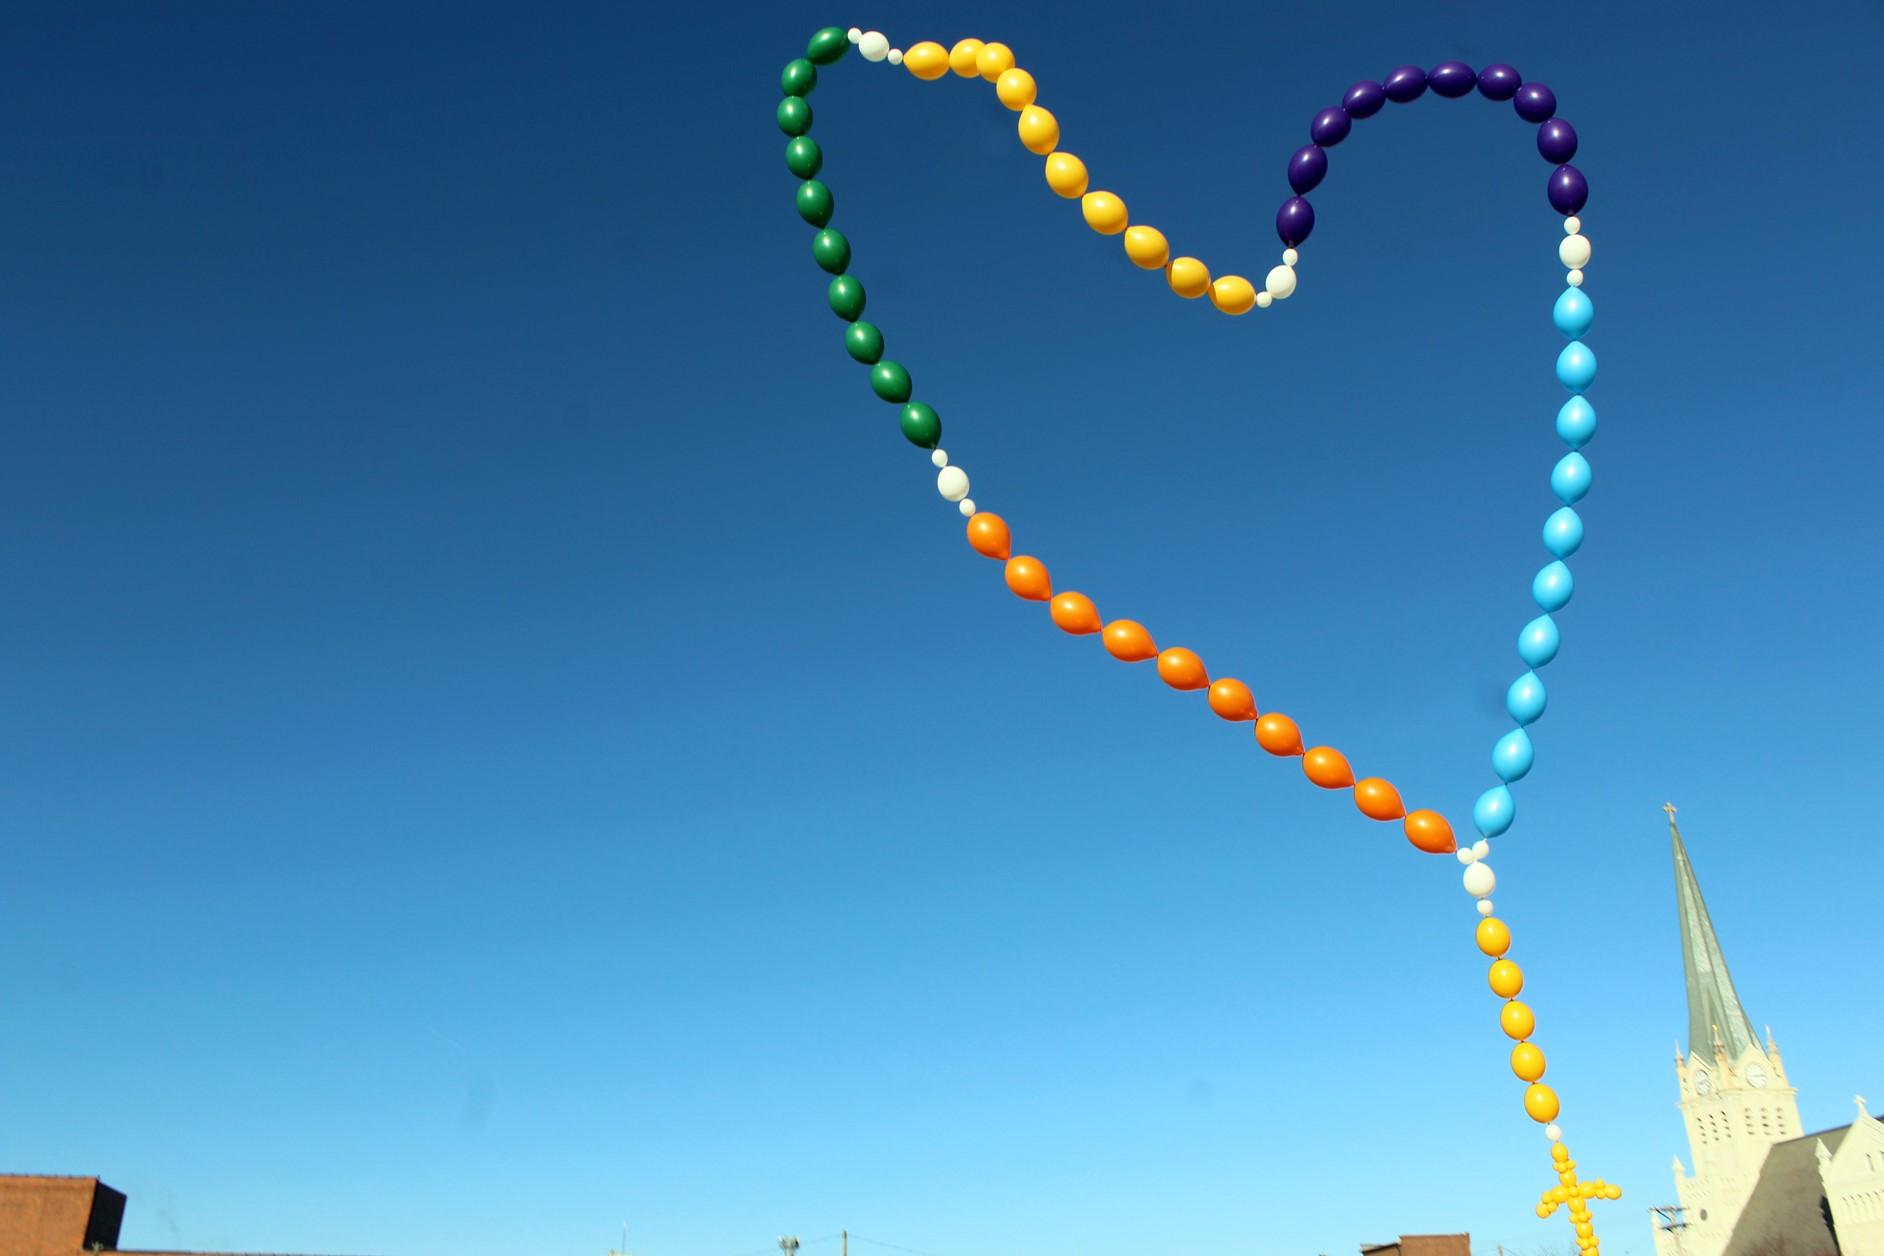 K-12 Rosary Balloon Release